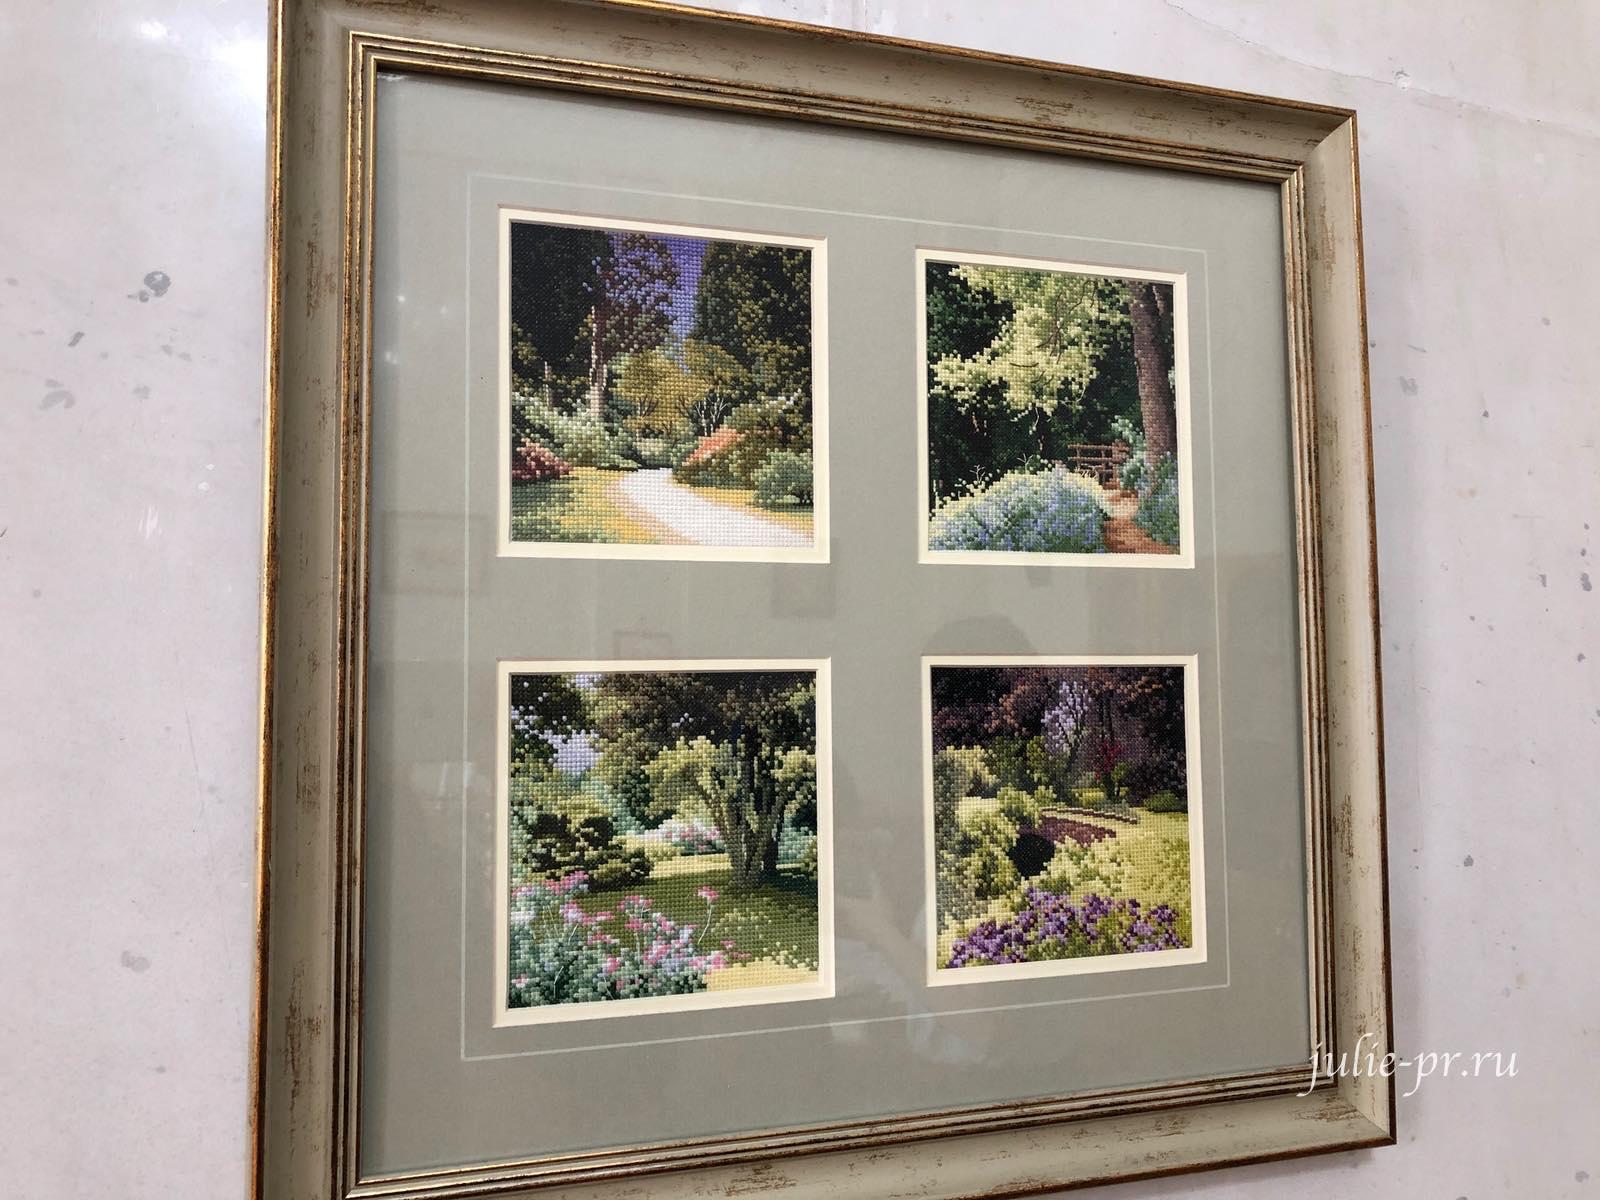 Summer Shade, Hidden Bridge, Woodland path, Bluebell wood, вышивка крестом, Heritage, John Clayton, выставка Грани Джона Клейтона